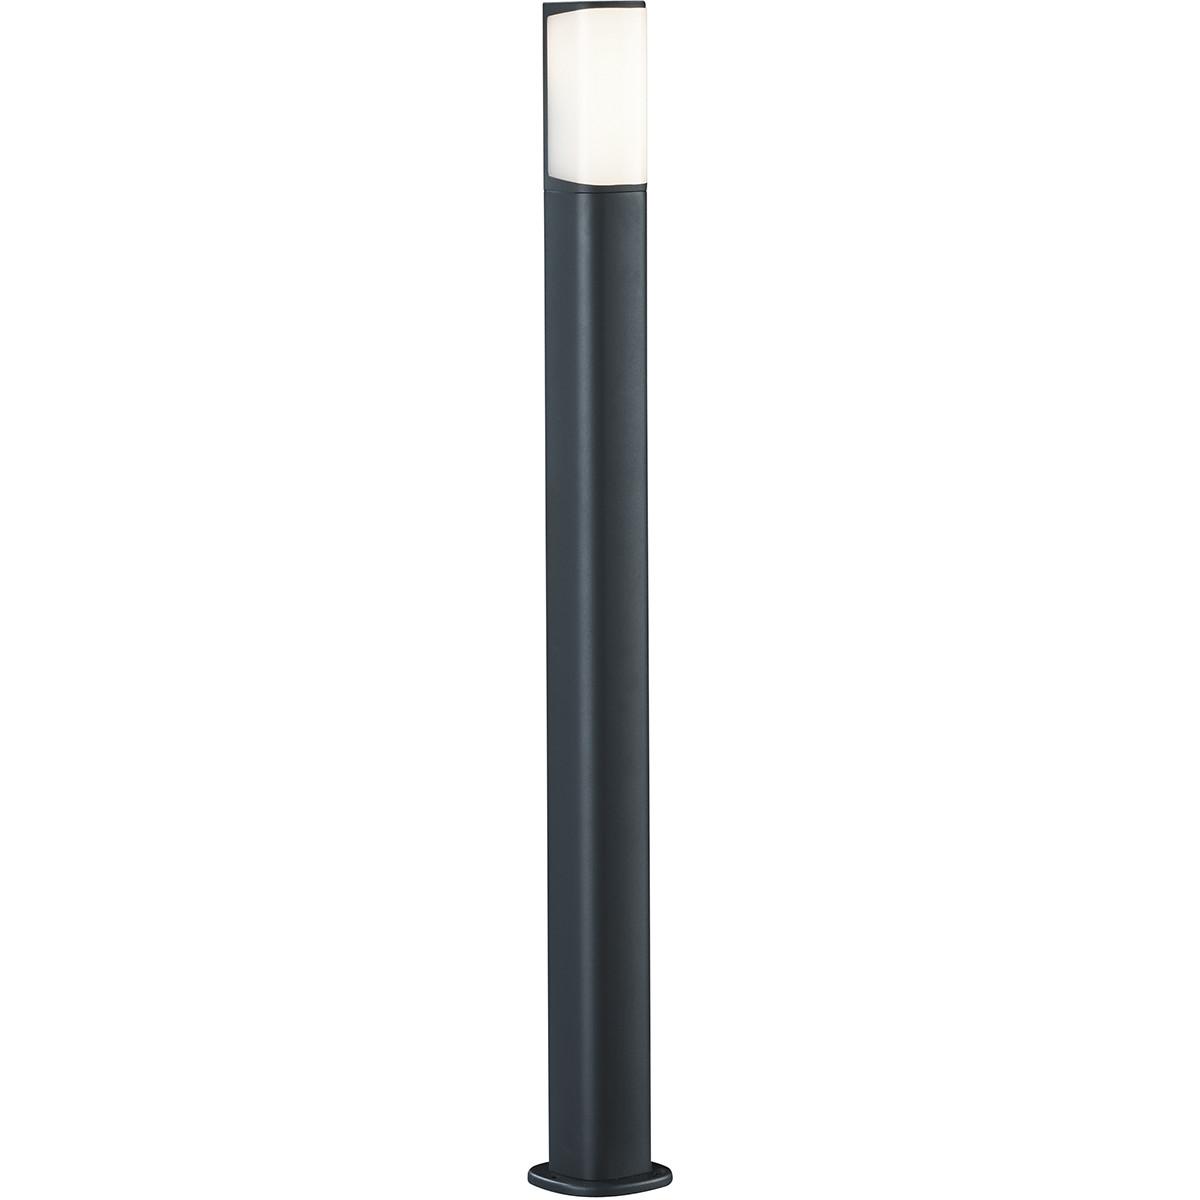 LED Tuinverlichting - Buitenlamp - Trion Ticani XL - Staand - 5W - Mat Zwart - Aluminium